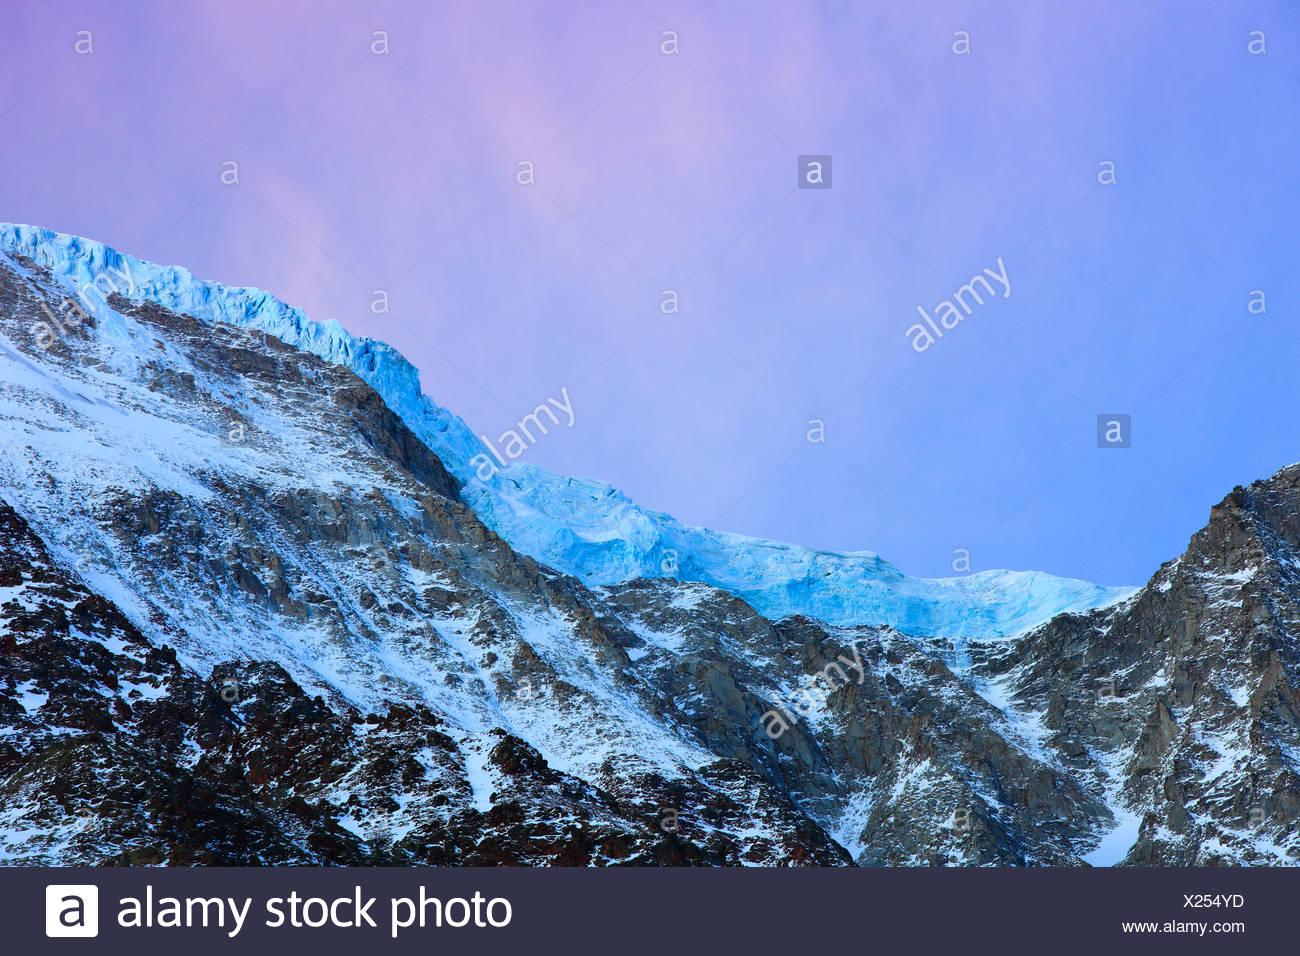 Evening mood, slopes, inclinations, glacier, slope glacier, Lötschental, Valais, Switzerland, Europe, alpine, pink, sky, freezes - Stock Image